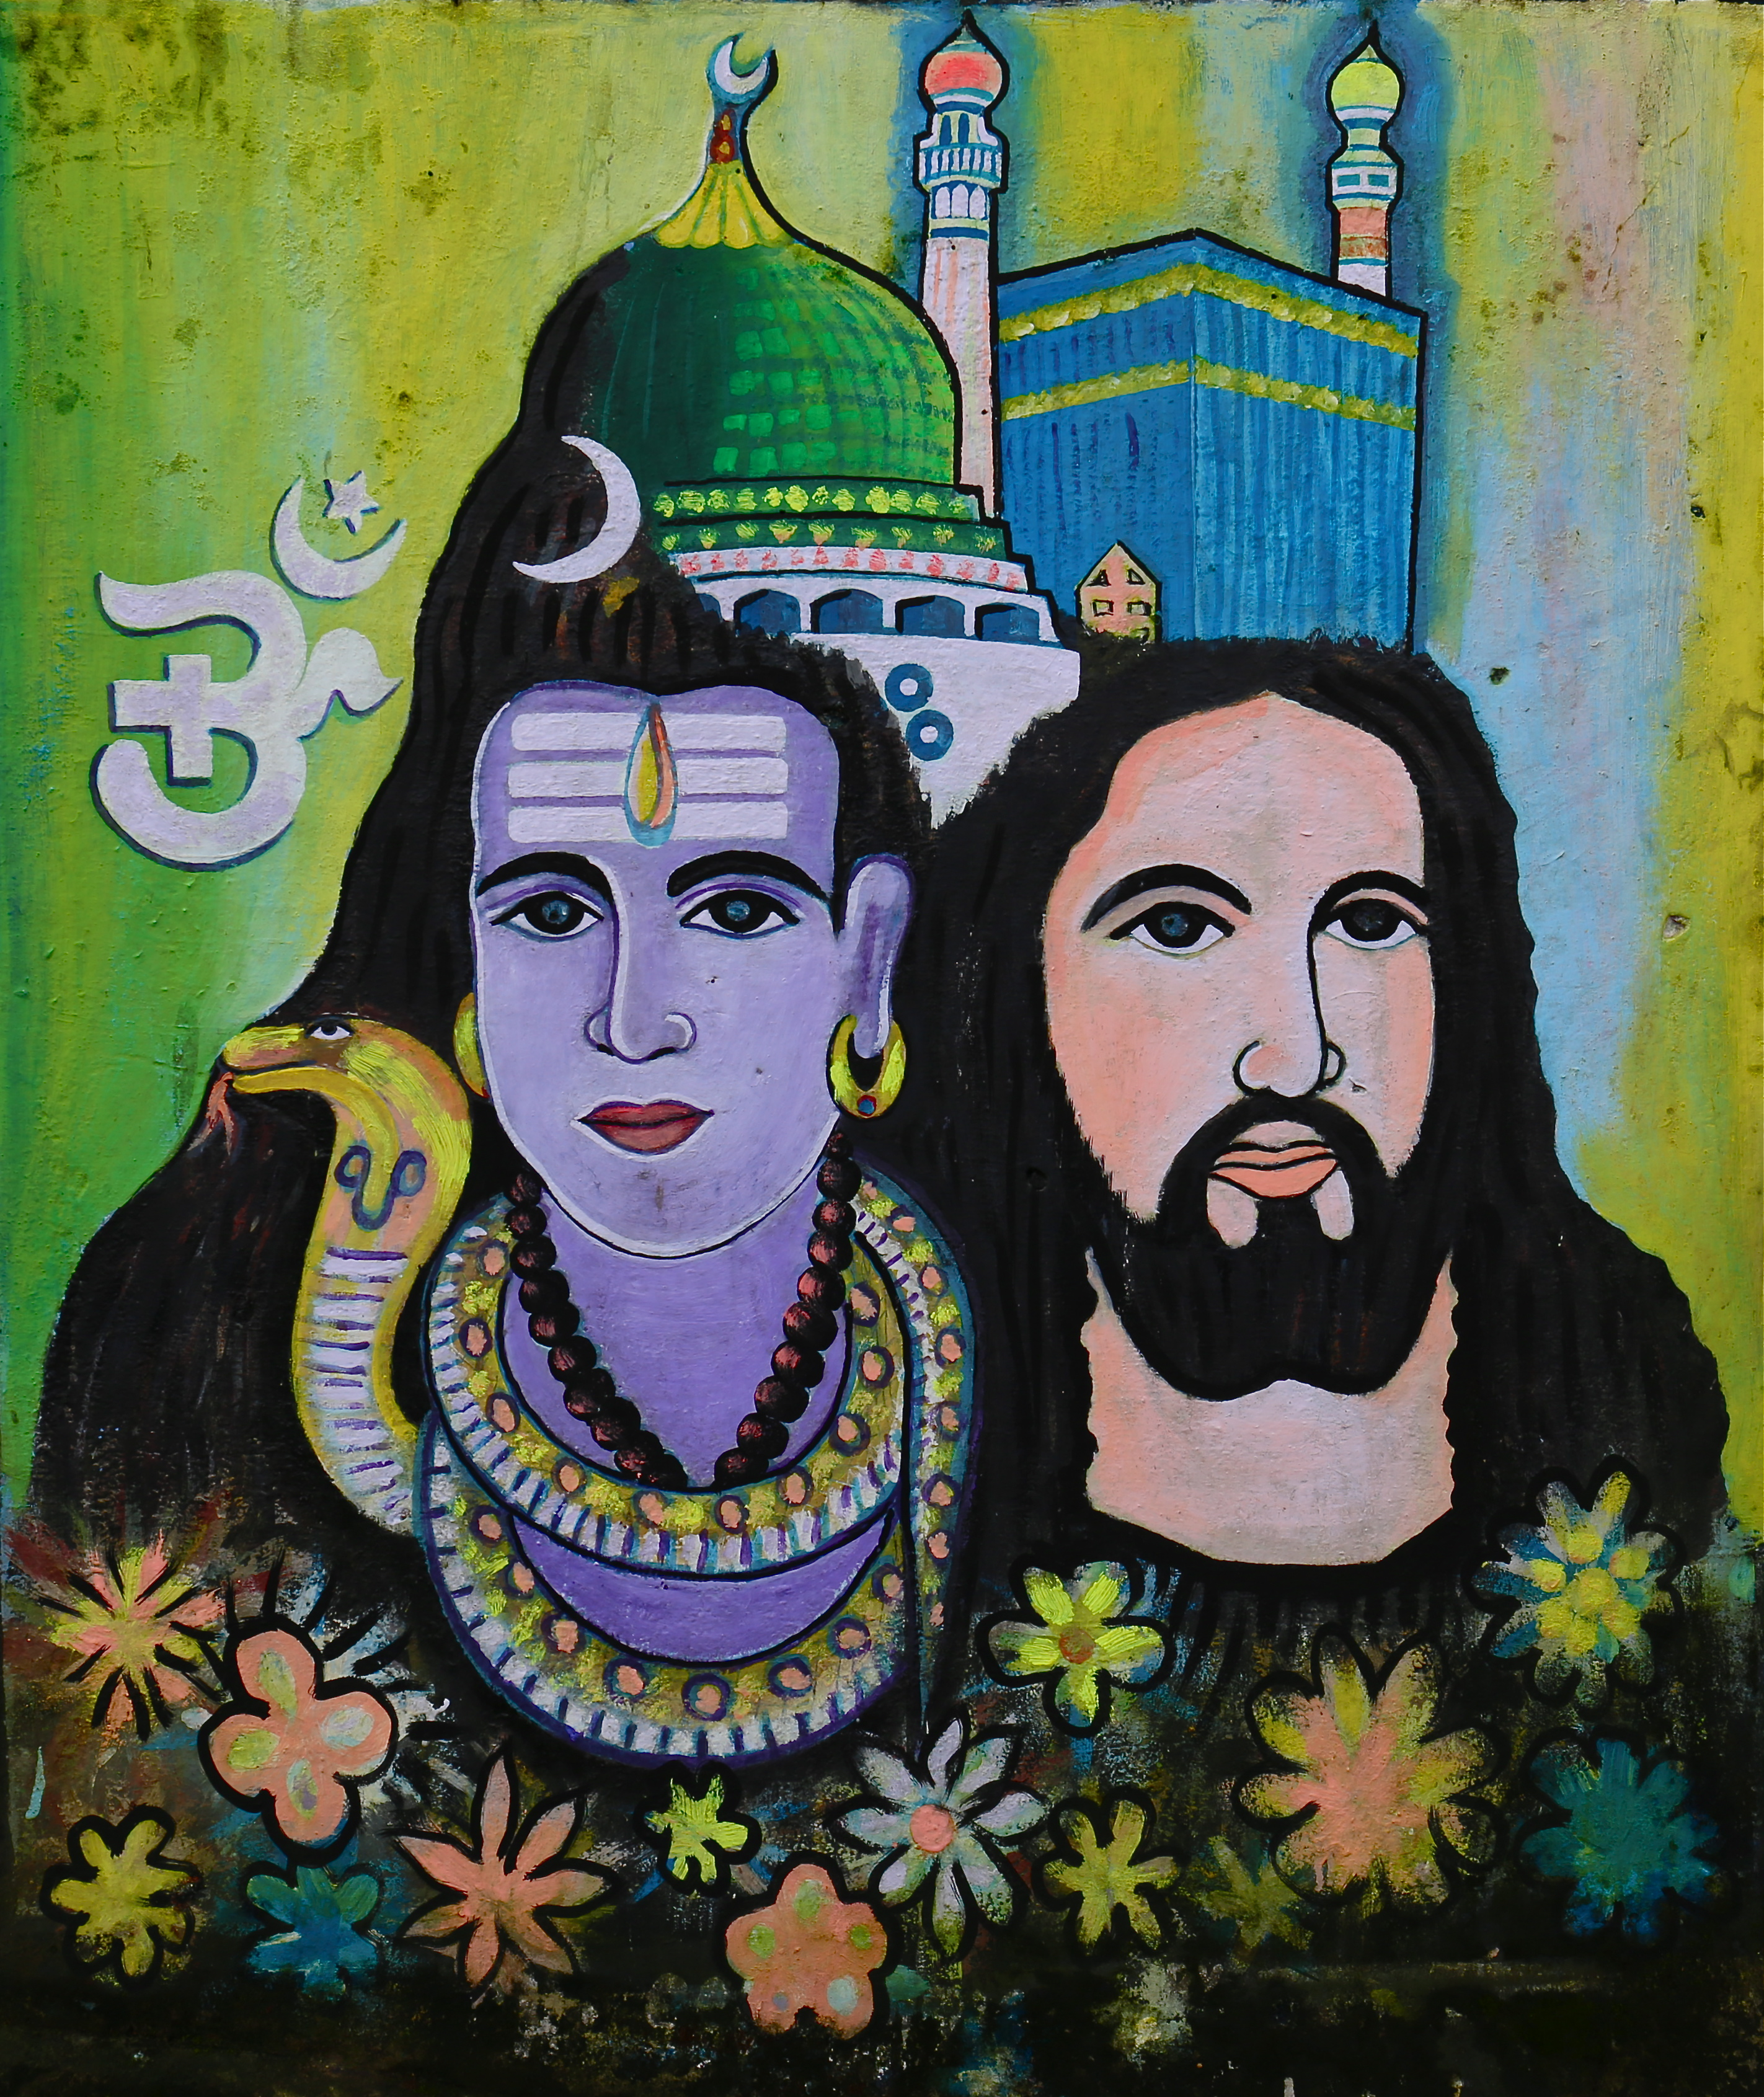 Śiva, Jésus, Islam, les 3 grandes religions, peinture murale à Fort Kochin - Kerala